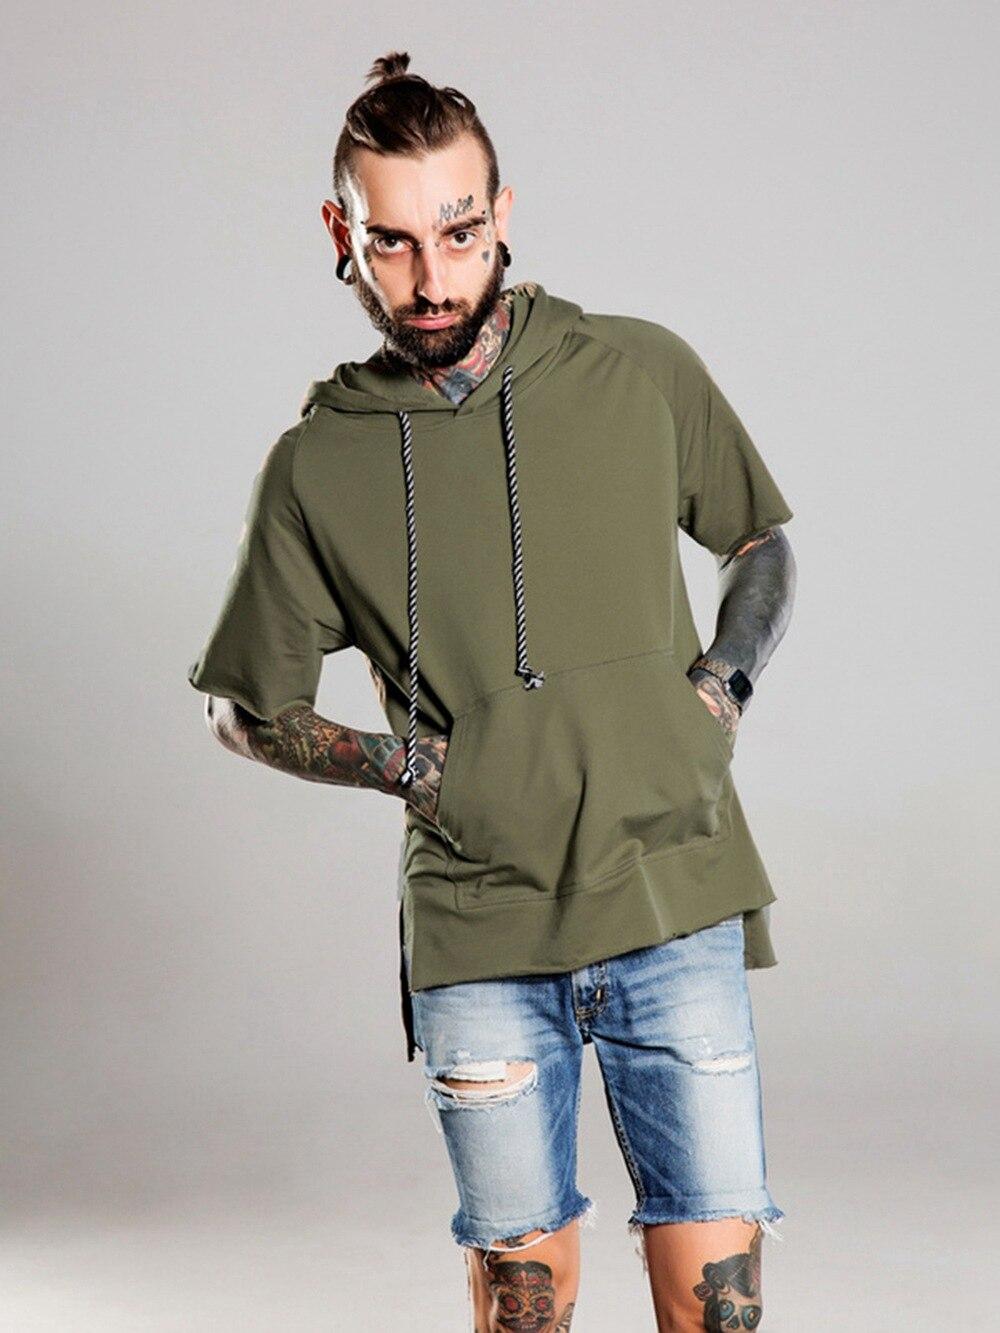 Shirt design for man 2016 - 2016 Summer Pure T Shirt Tarmac Black Wholesale Hoodies Shirt Mens Hip Hop New Design